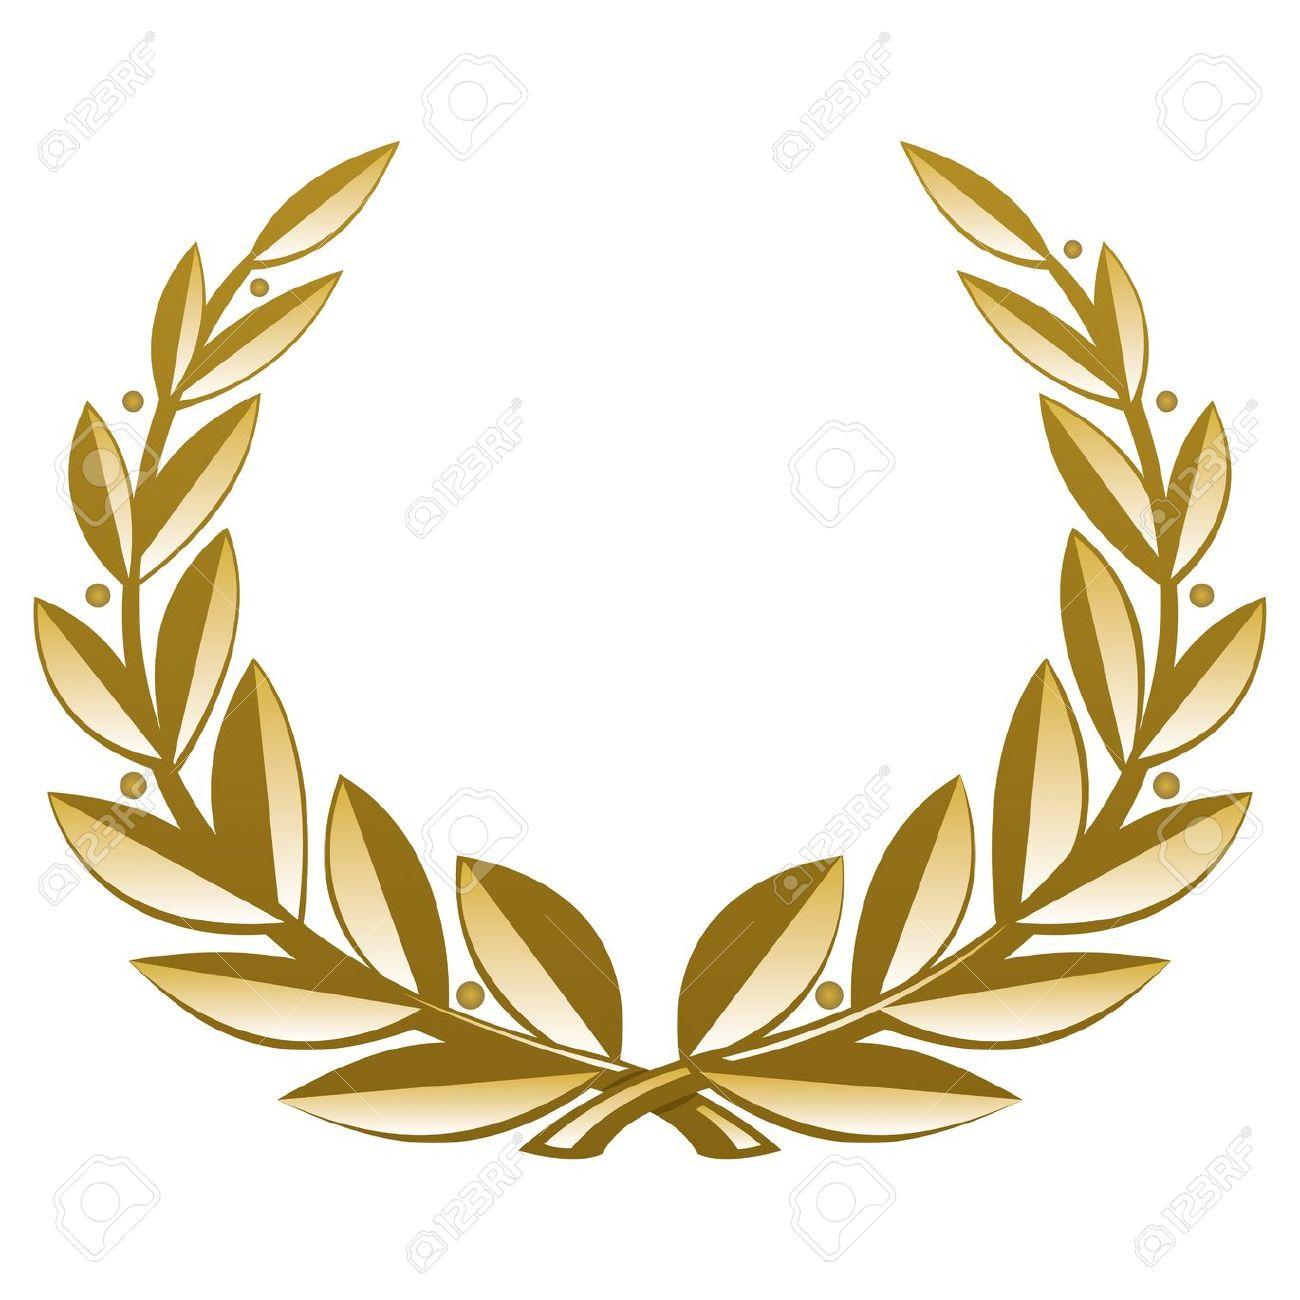 Golden Wreath. Vector Illustration (EPS V. 8.0) Royalty Free.